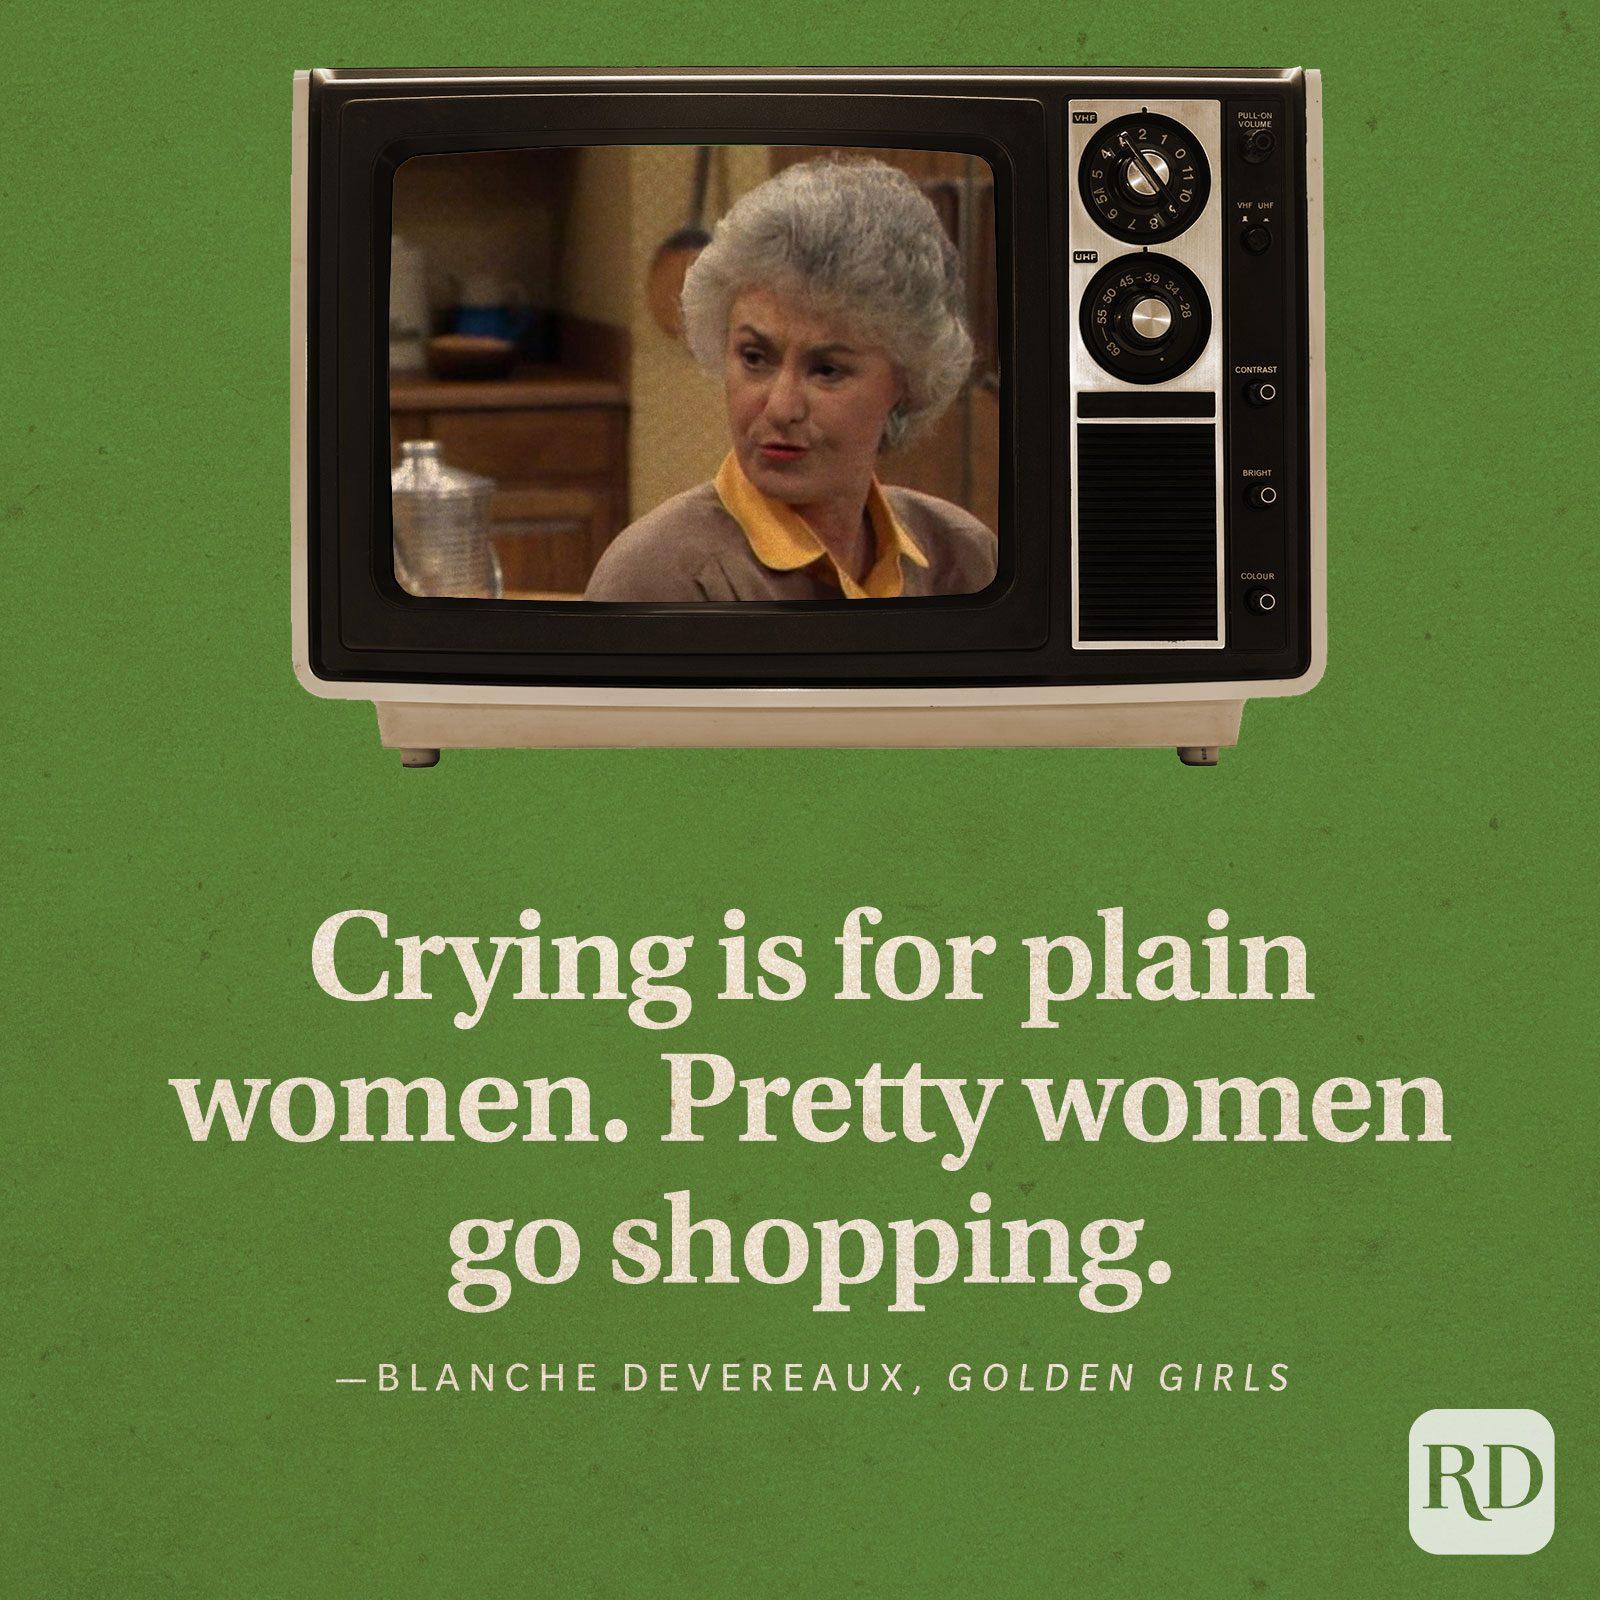 """Crying is for plain women. Pretty women go shopping."" —Blanche Devereaux in Golden Girls."